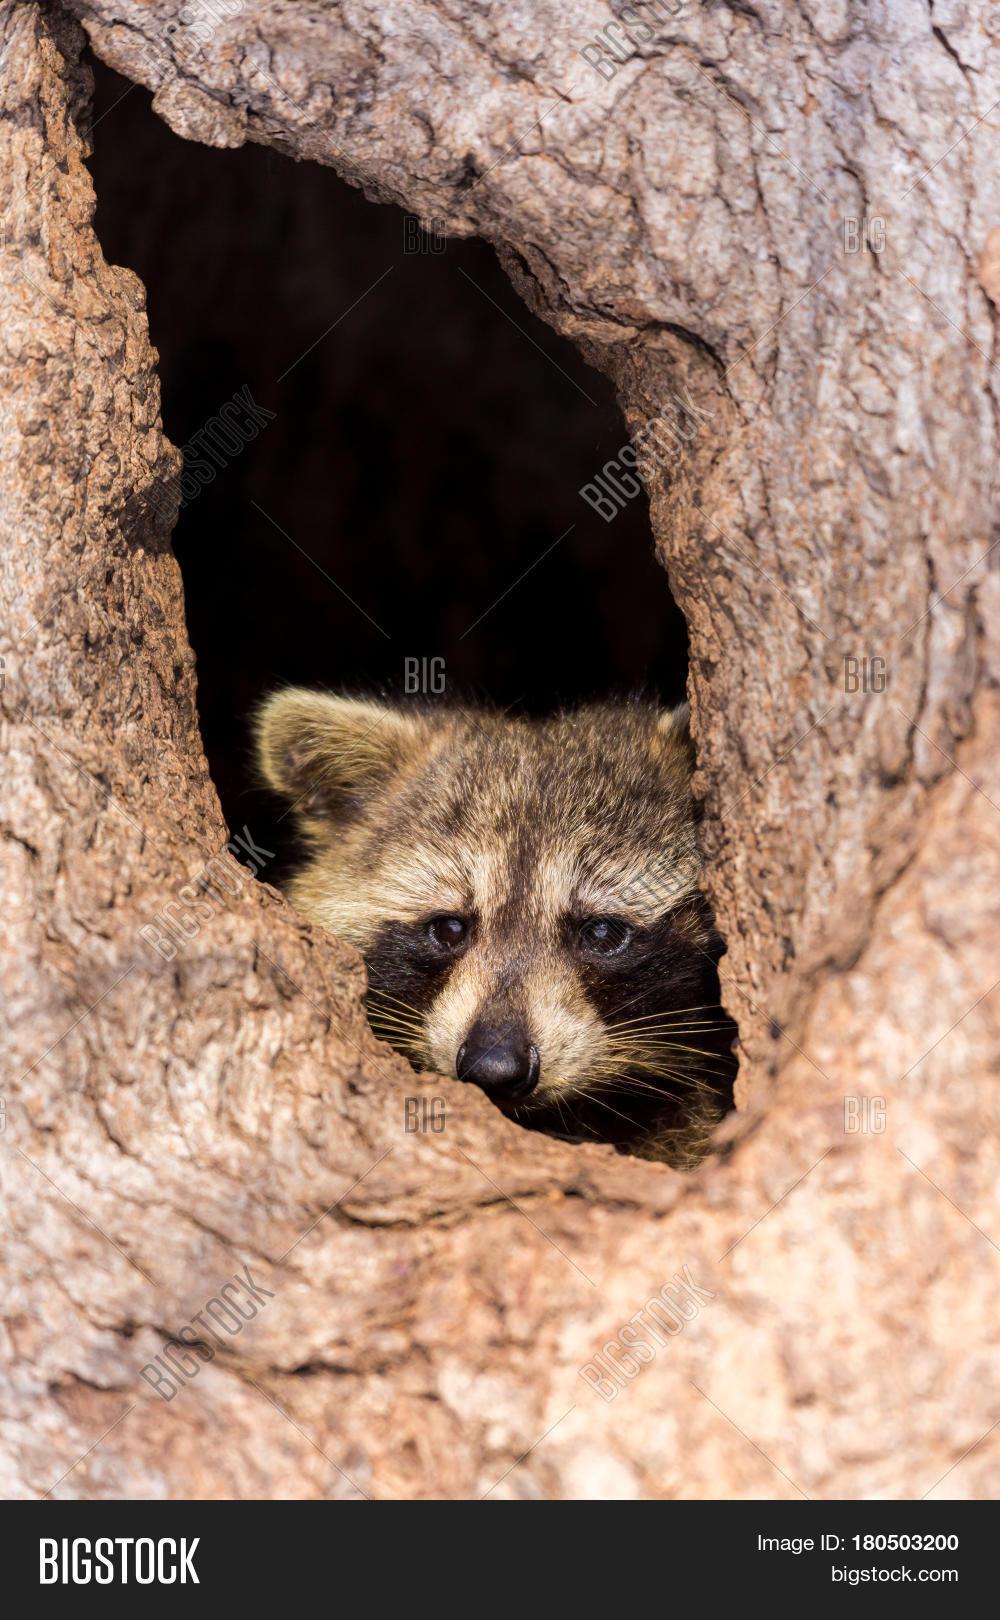 Bandit-masked Raccoons Image & Photo (Free Trial) | Bigstock